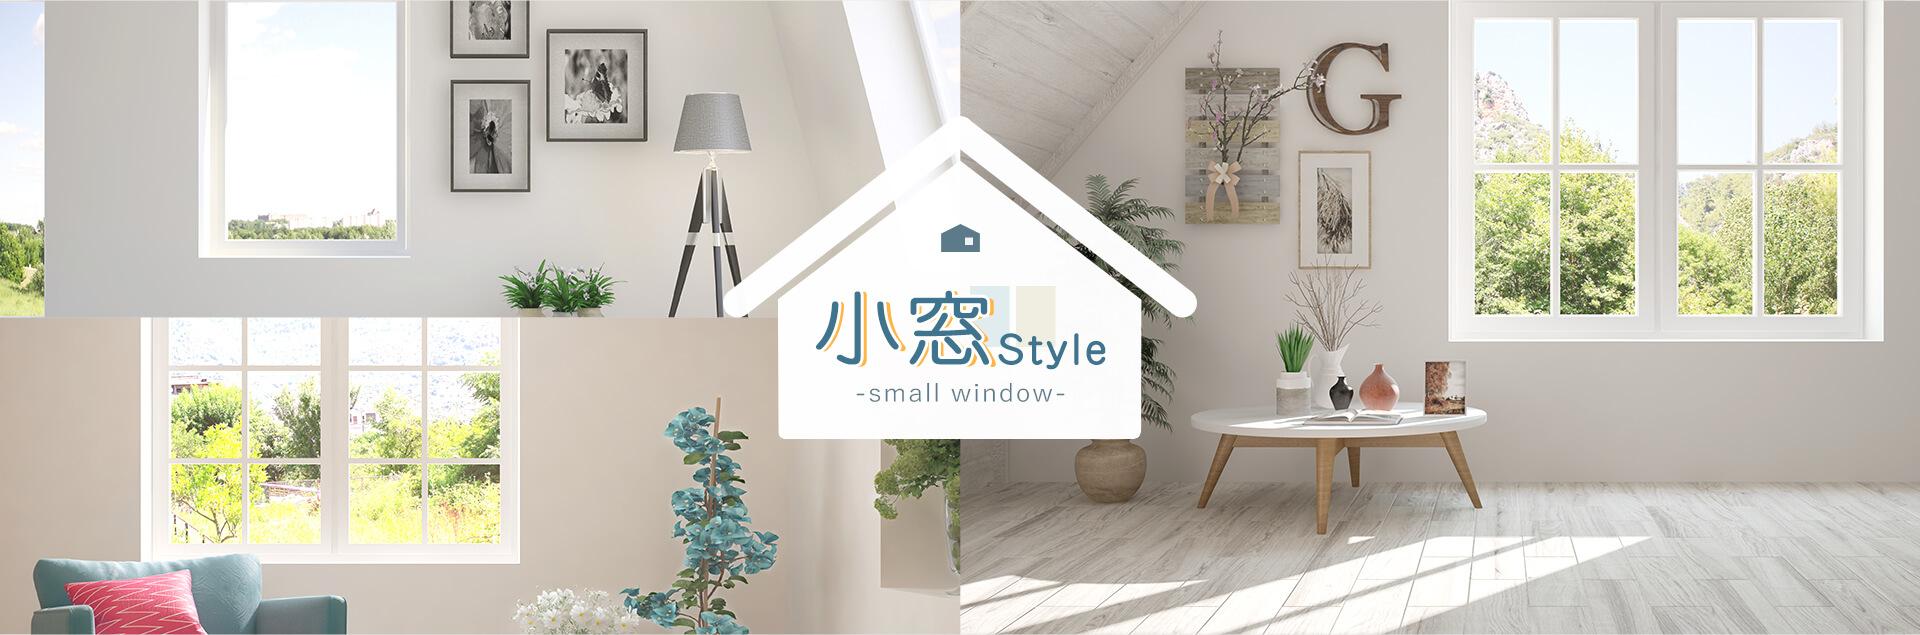 小窓Style -small window-